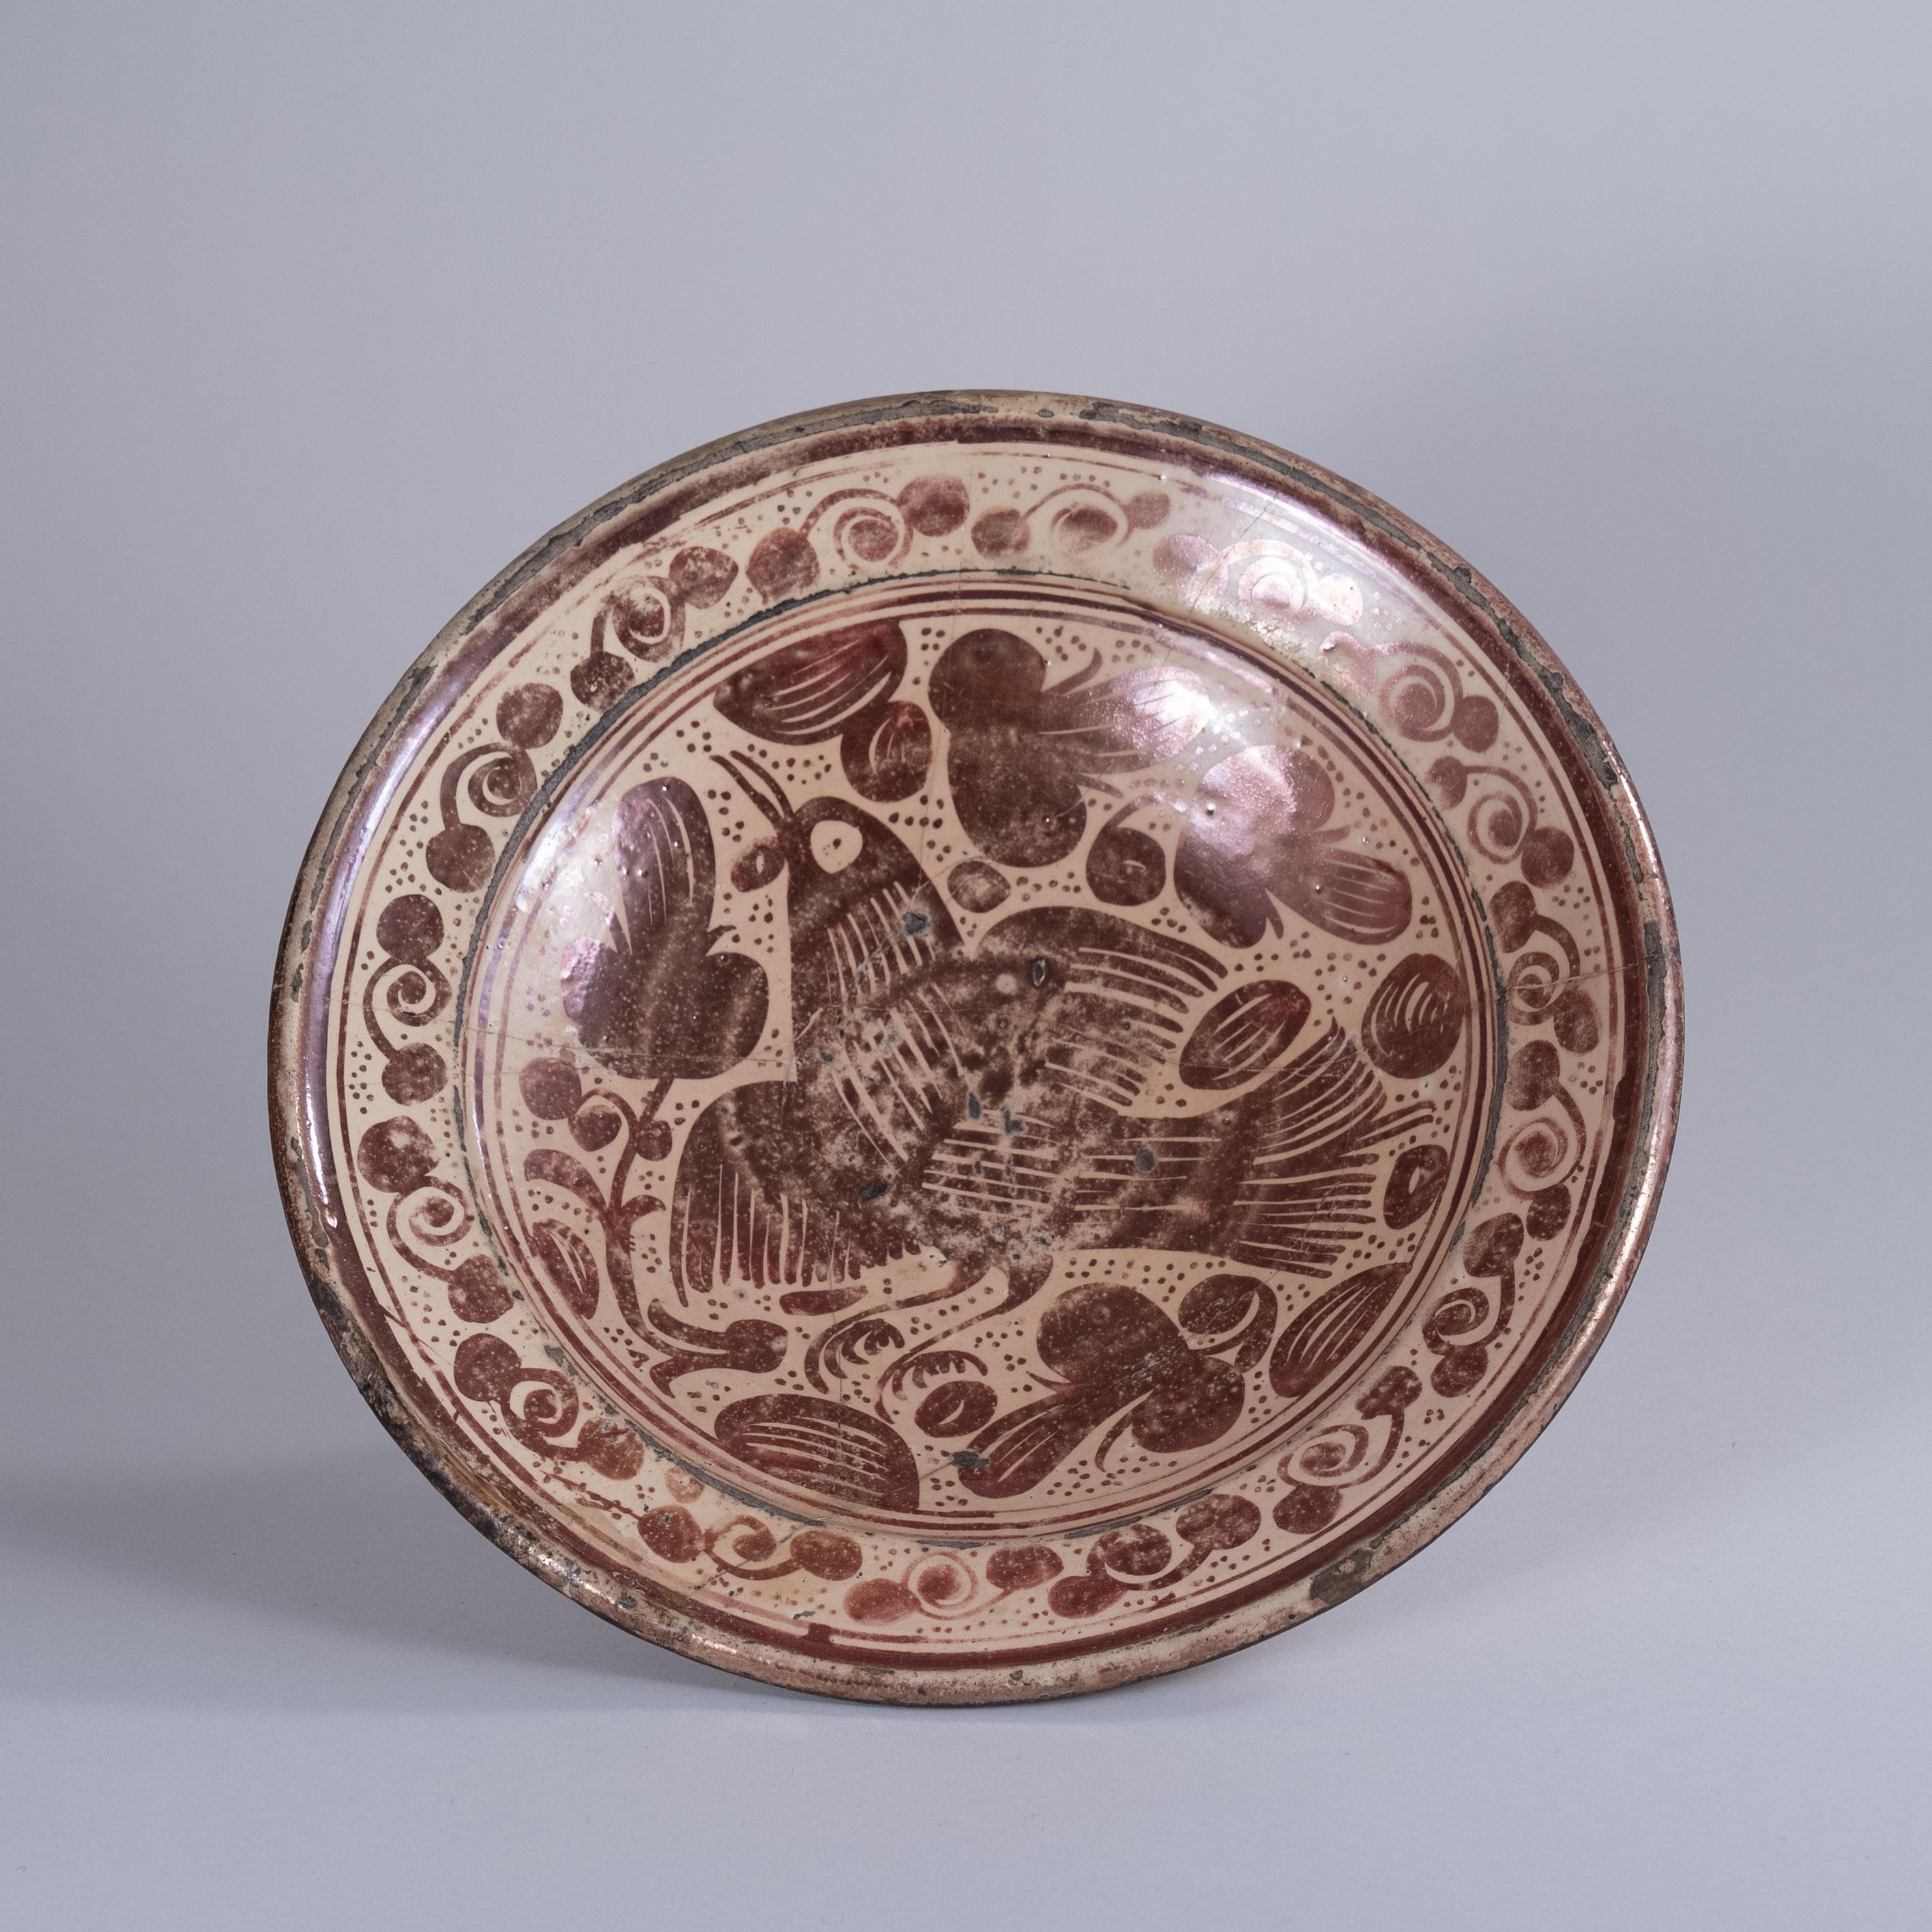 Early 18th Century Hispano Moresque Pottery Lustre Dish